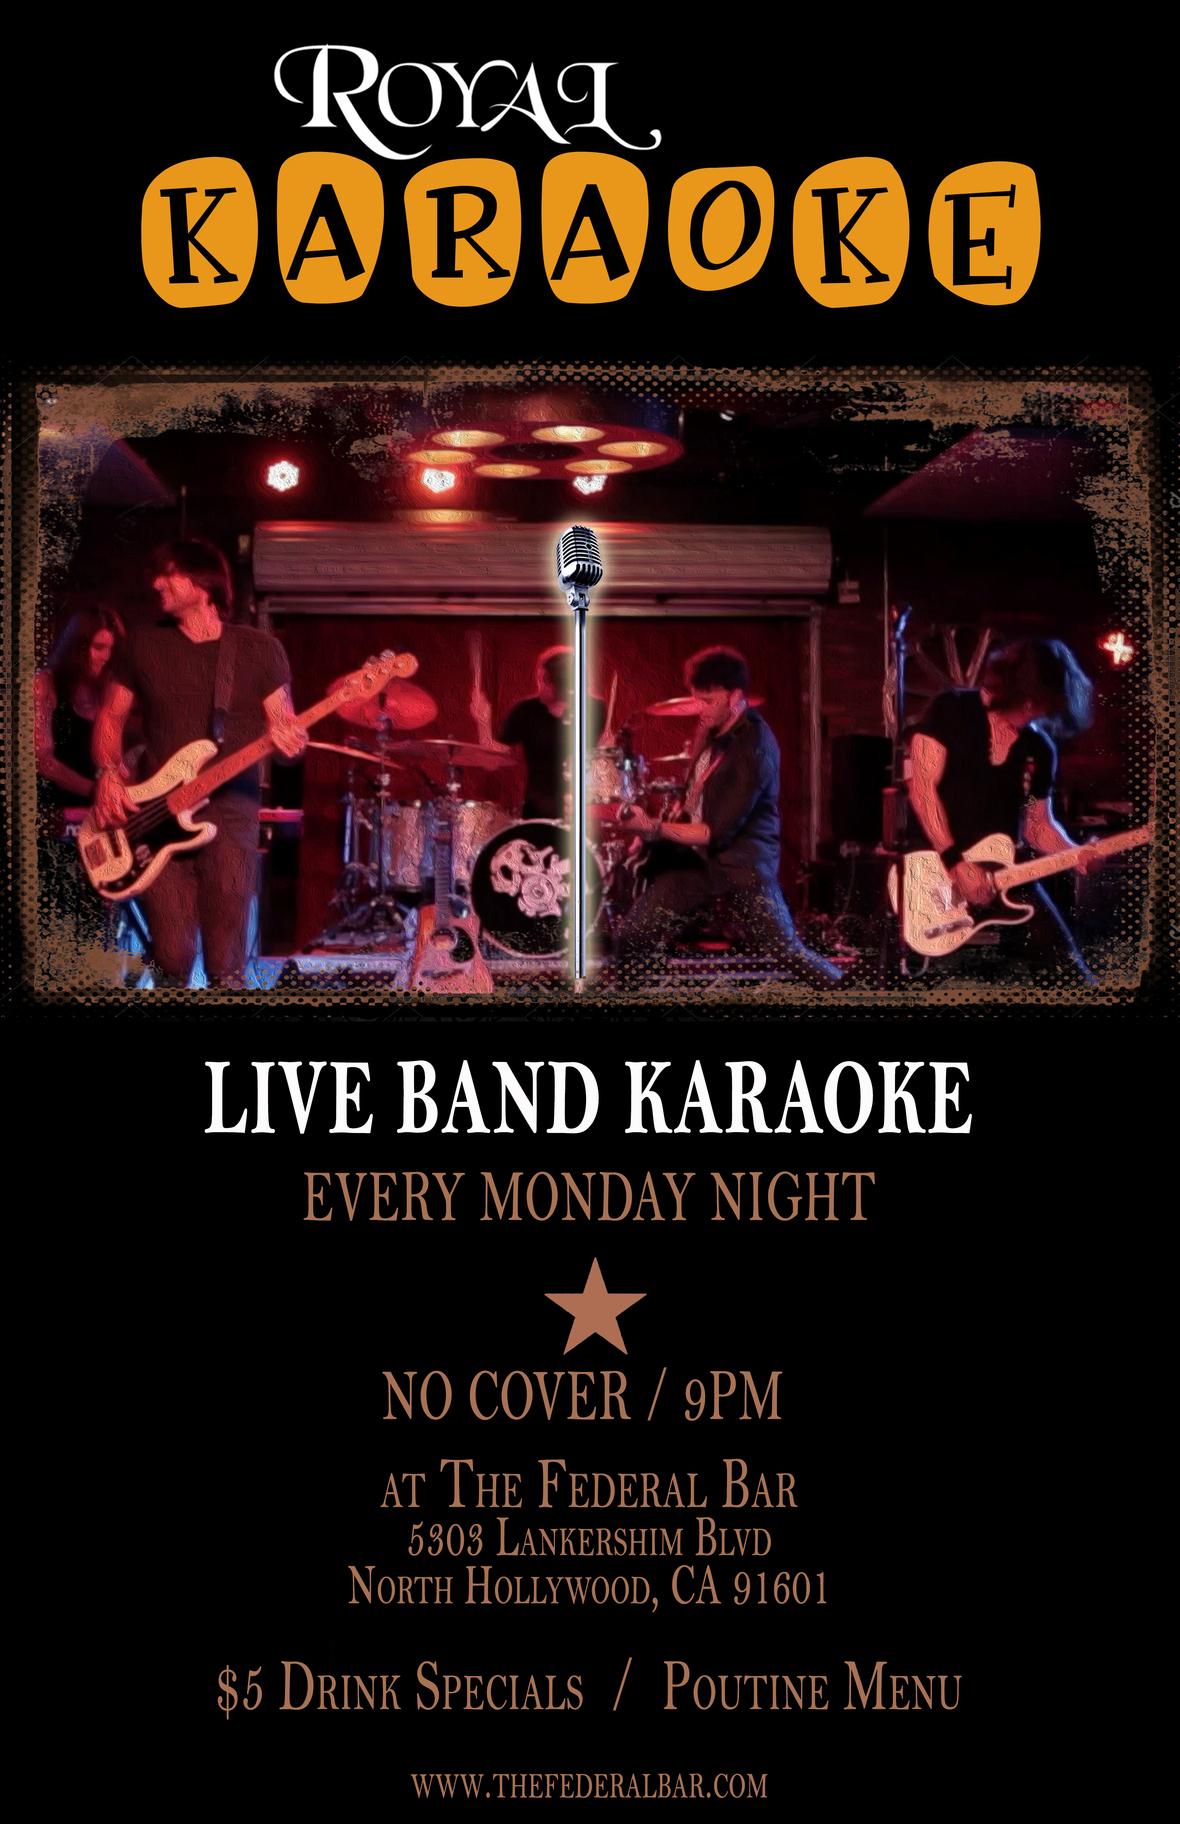 royal karaoke poster v2